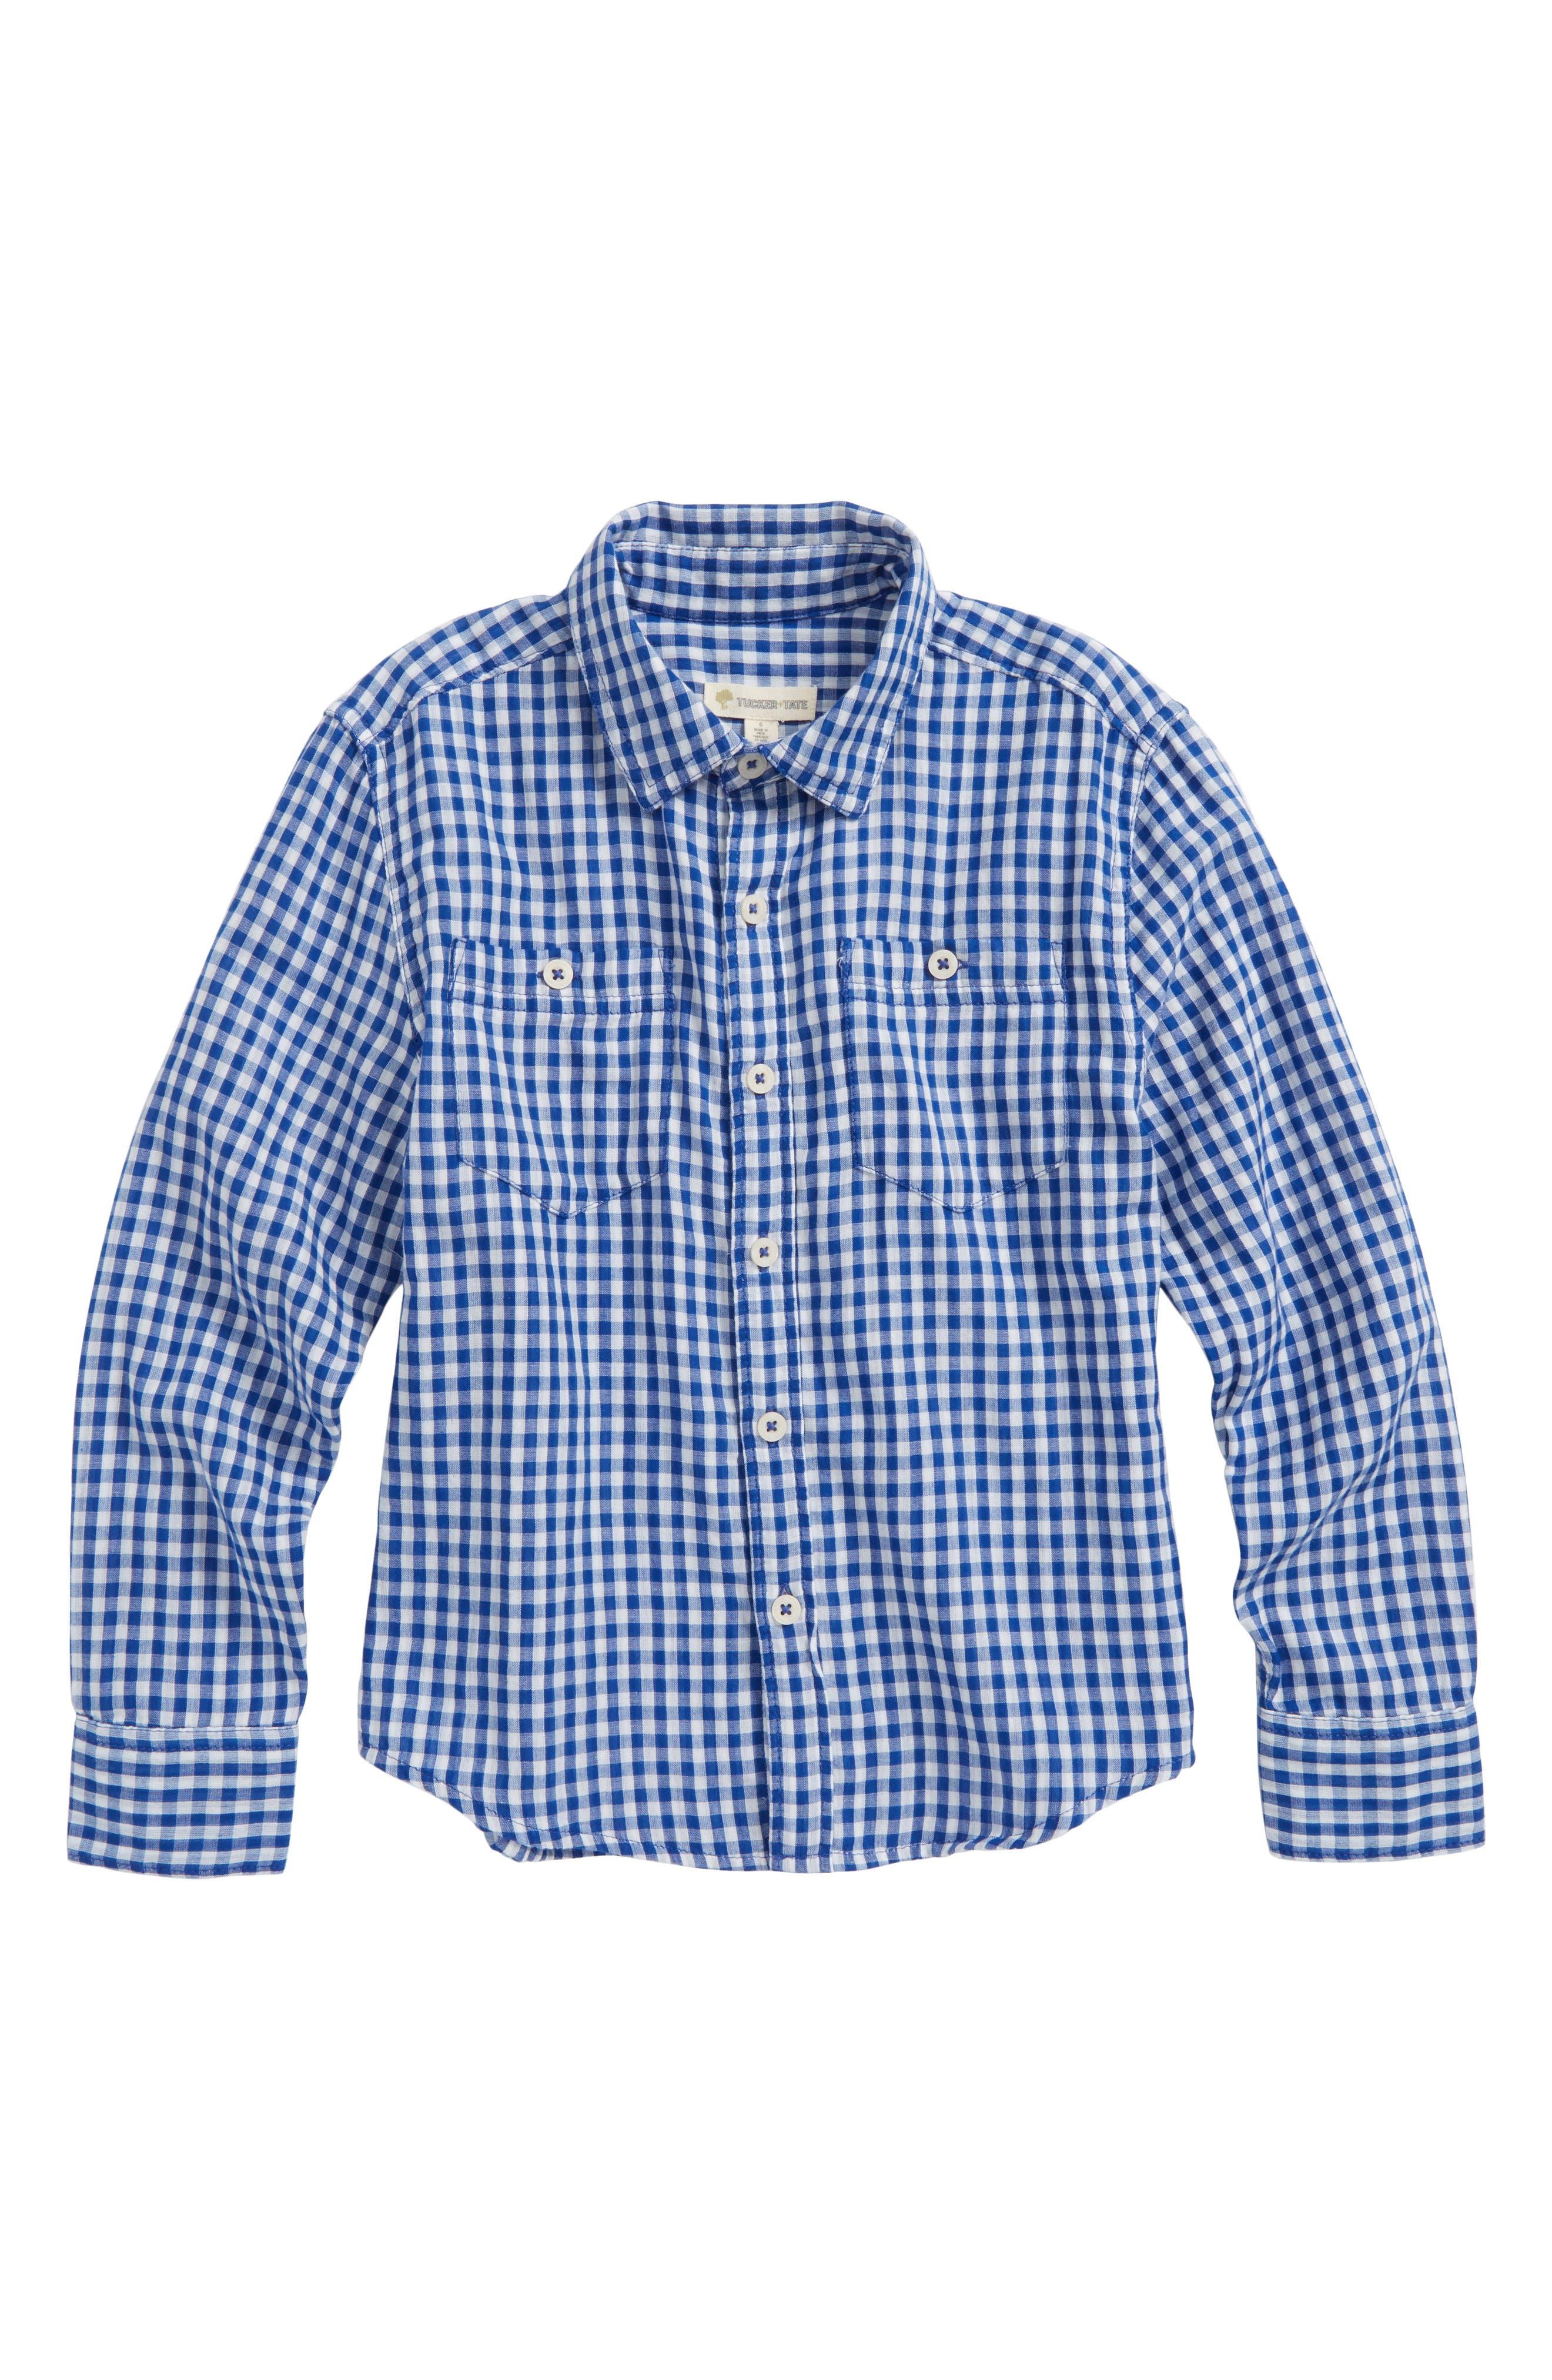 76a788faed561 Boys  Clothing  Hoodies